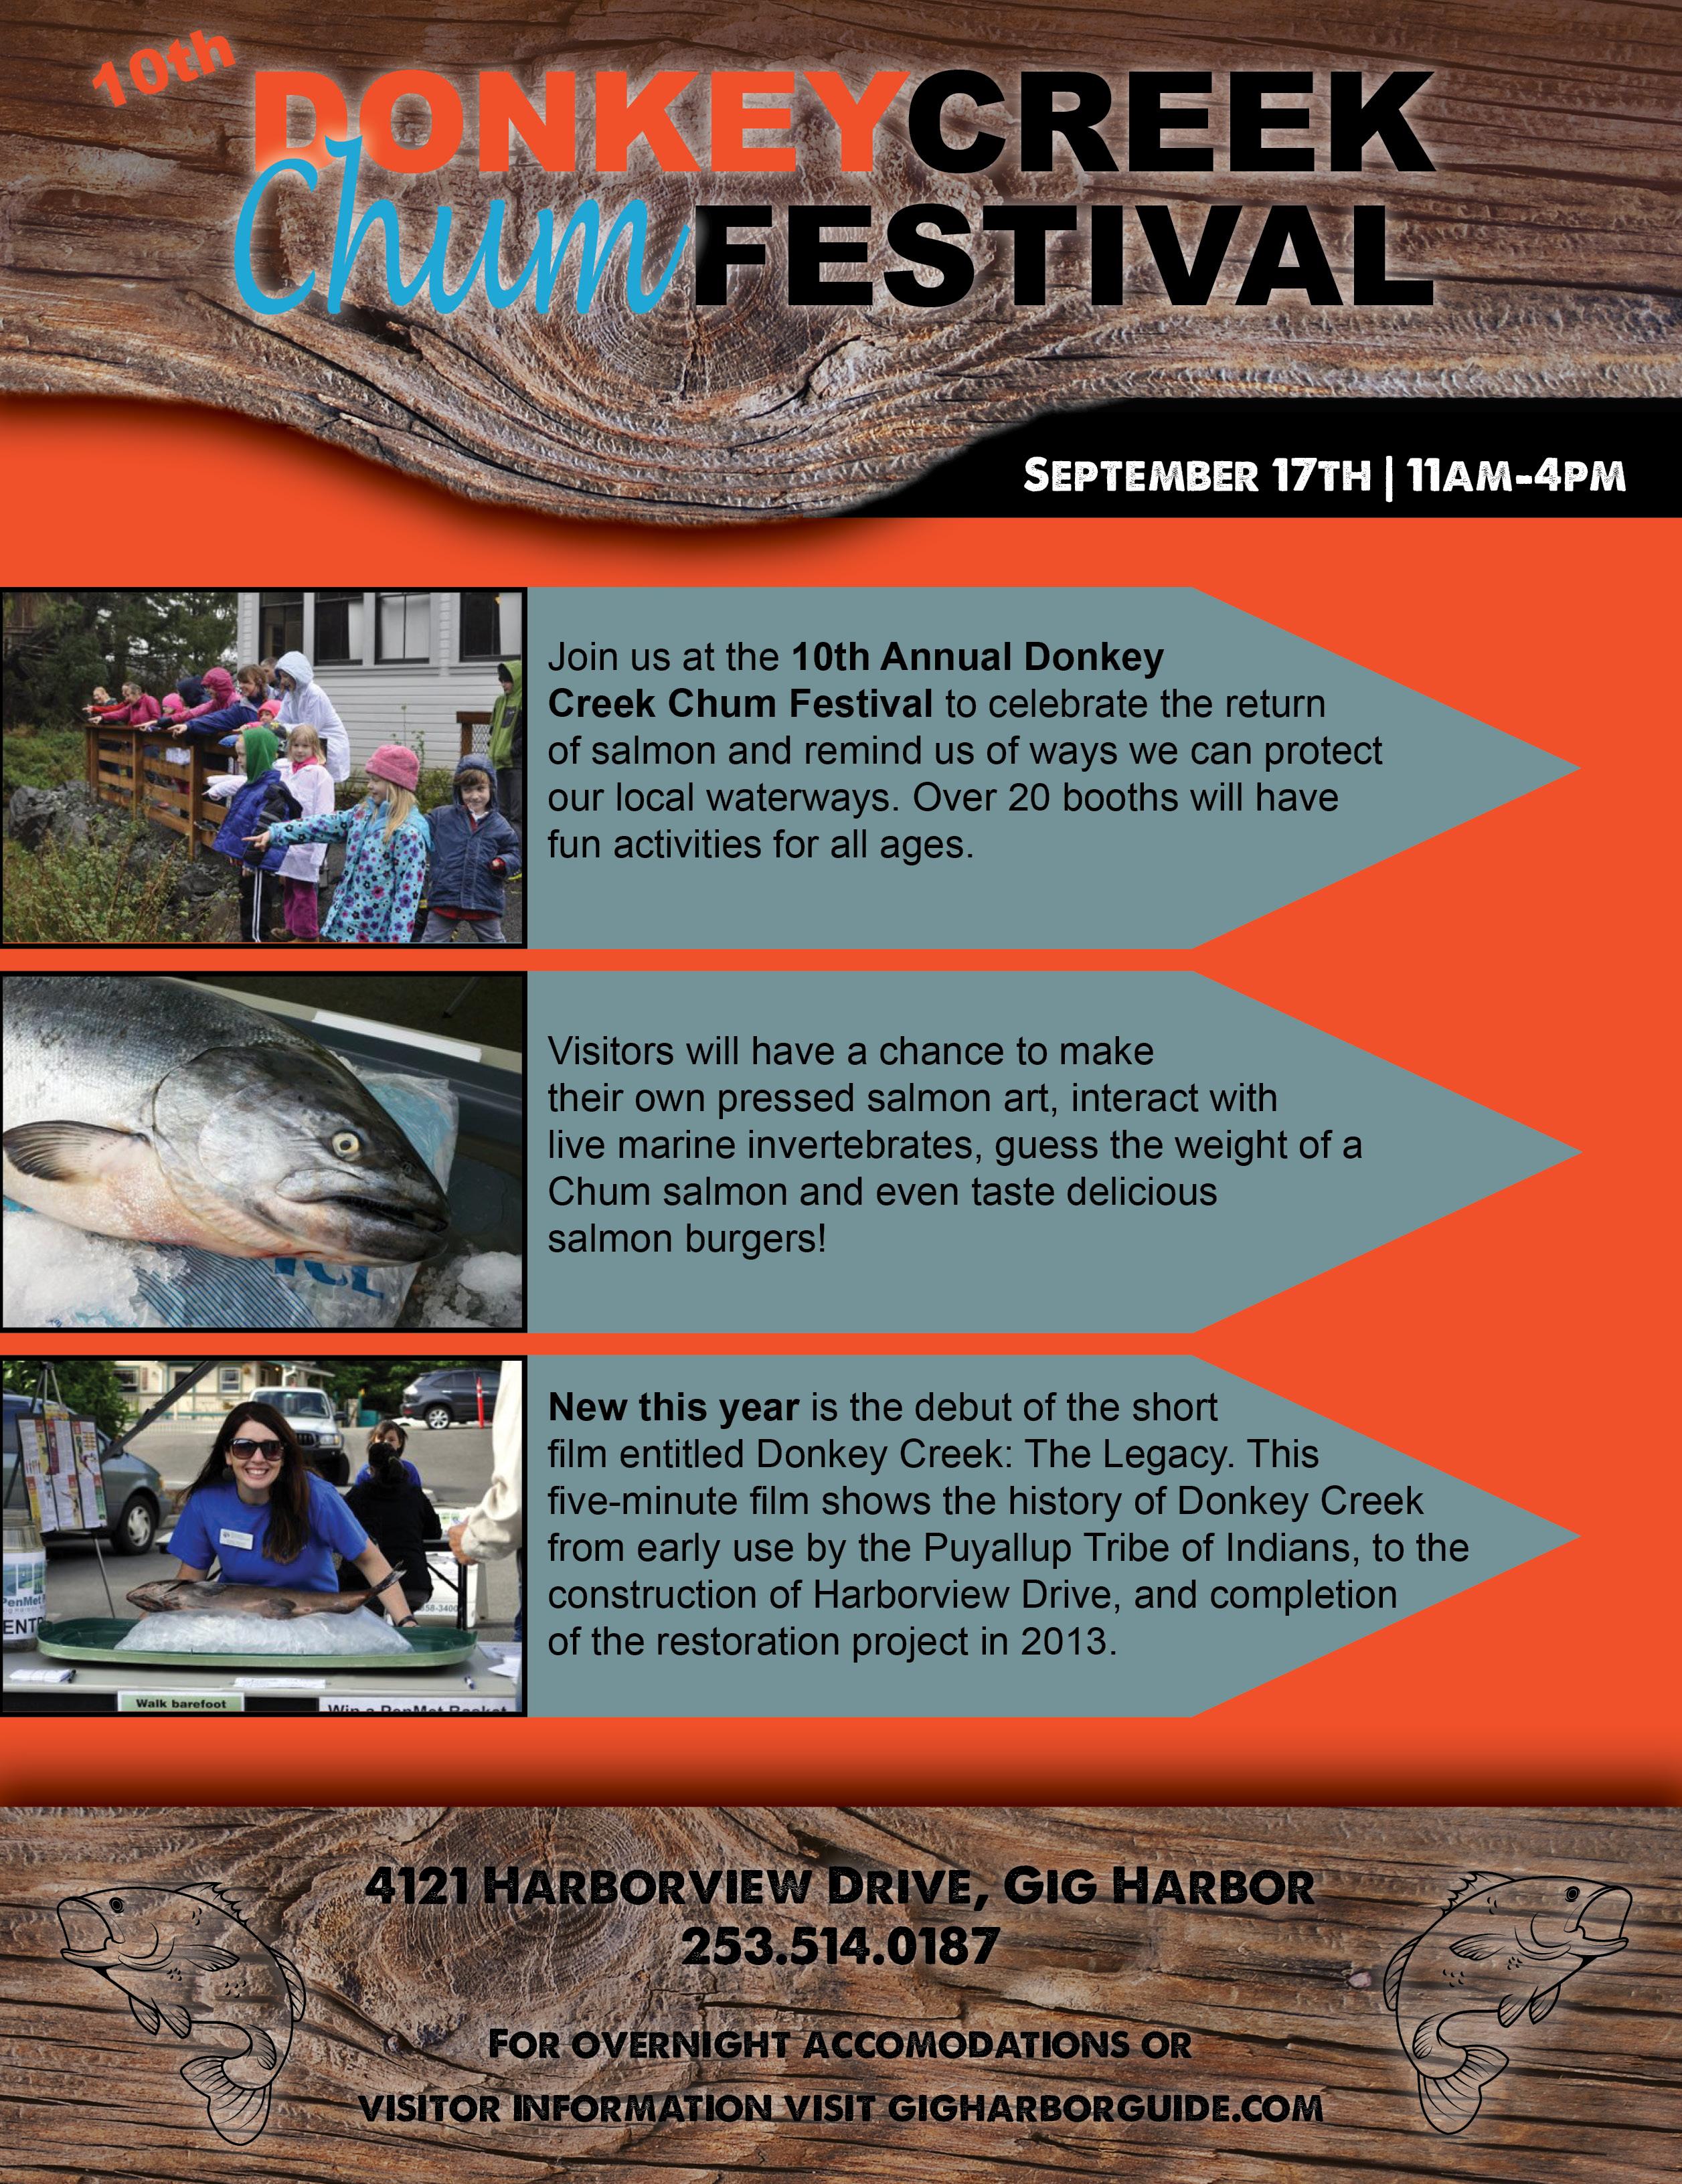 Donkey Creek Chum Festival